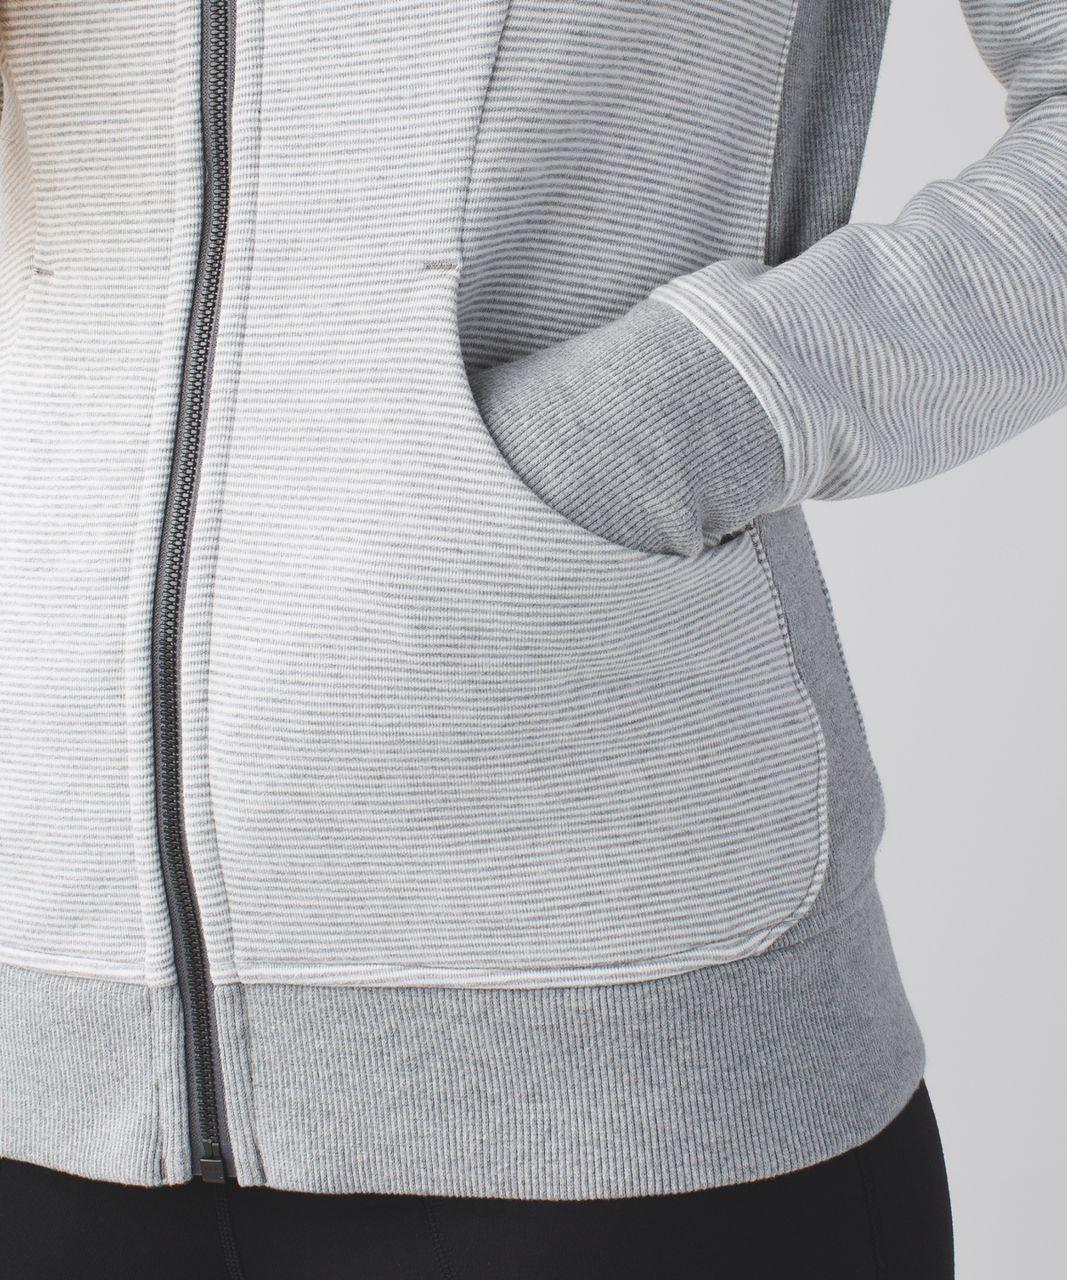 Lululemon Scuba Hoodie III (First Release) - Wee Stripe White Heathered Medium Grey / Heathered Medium Grey